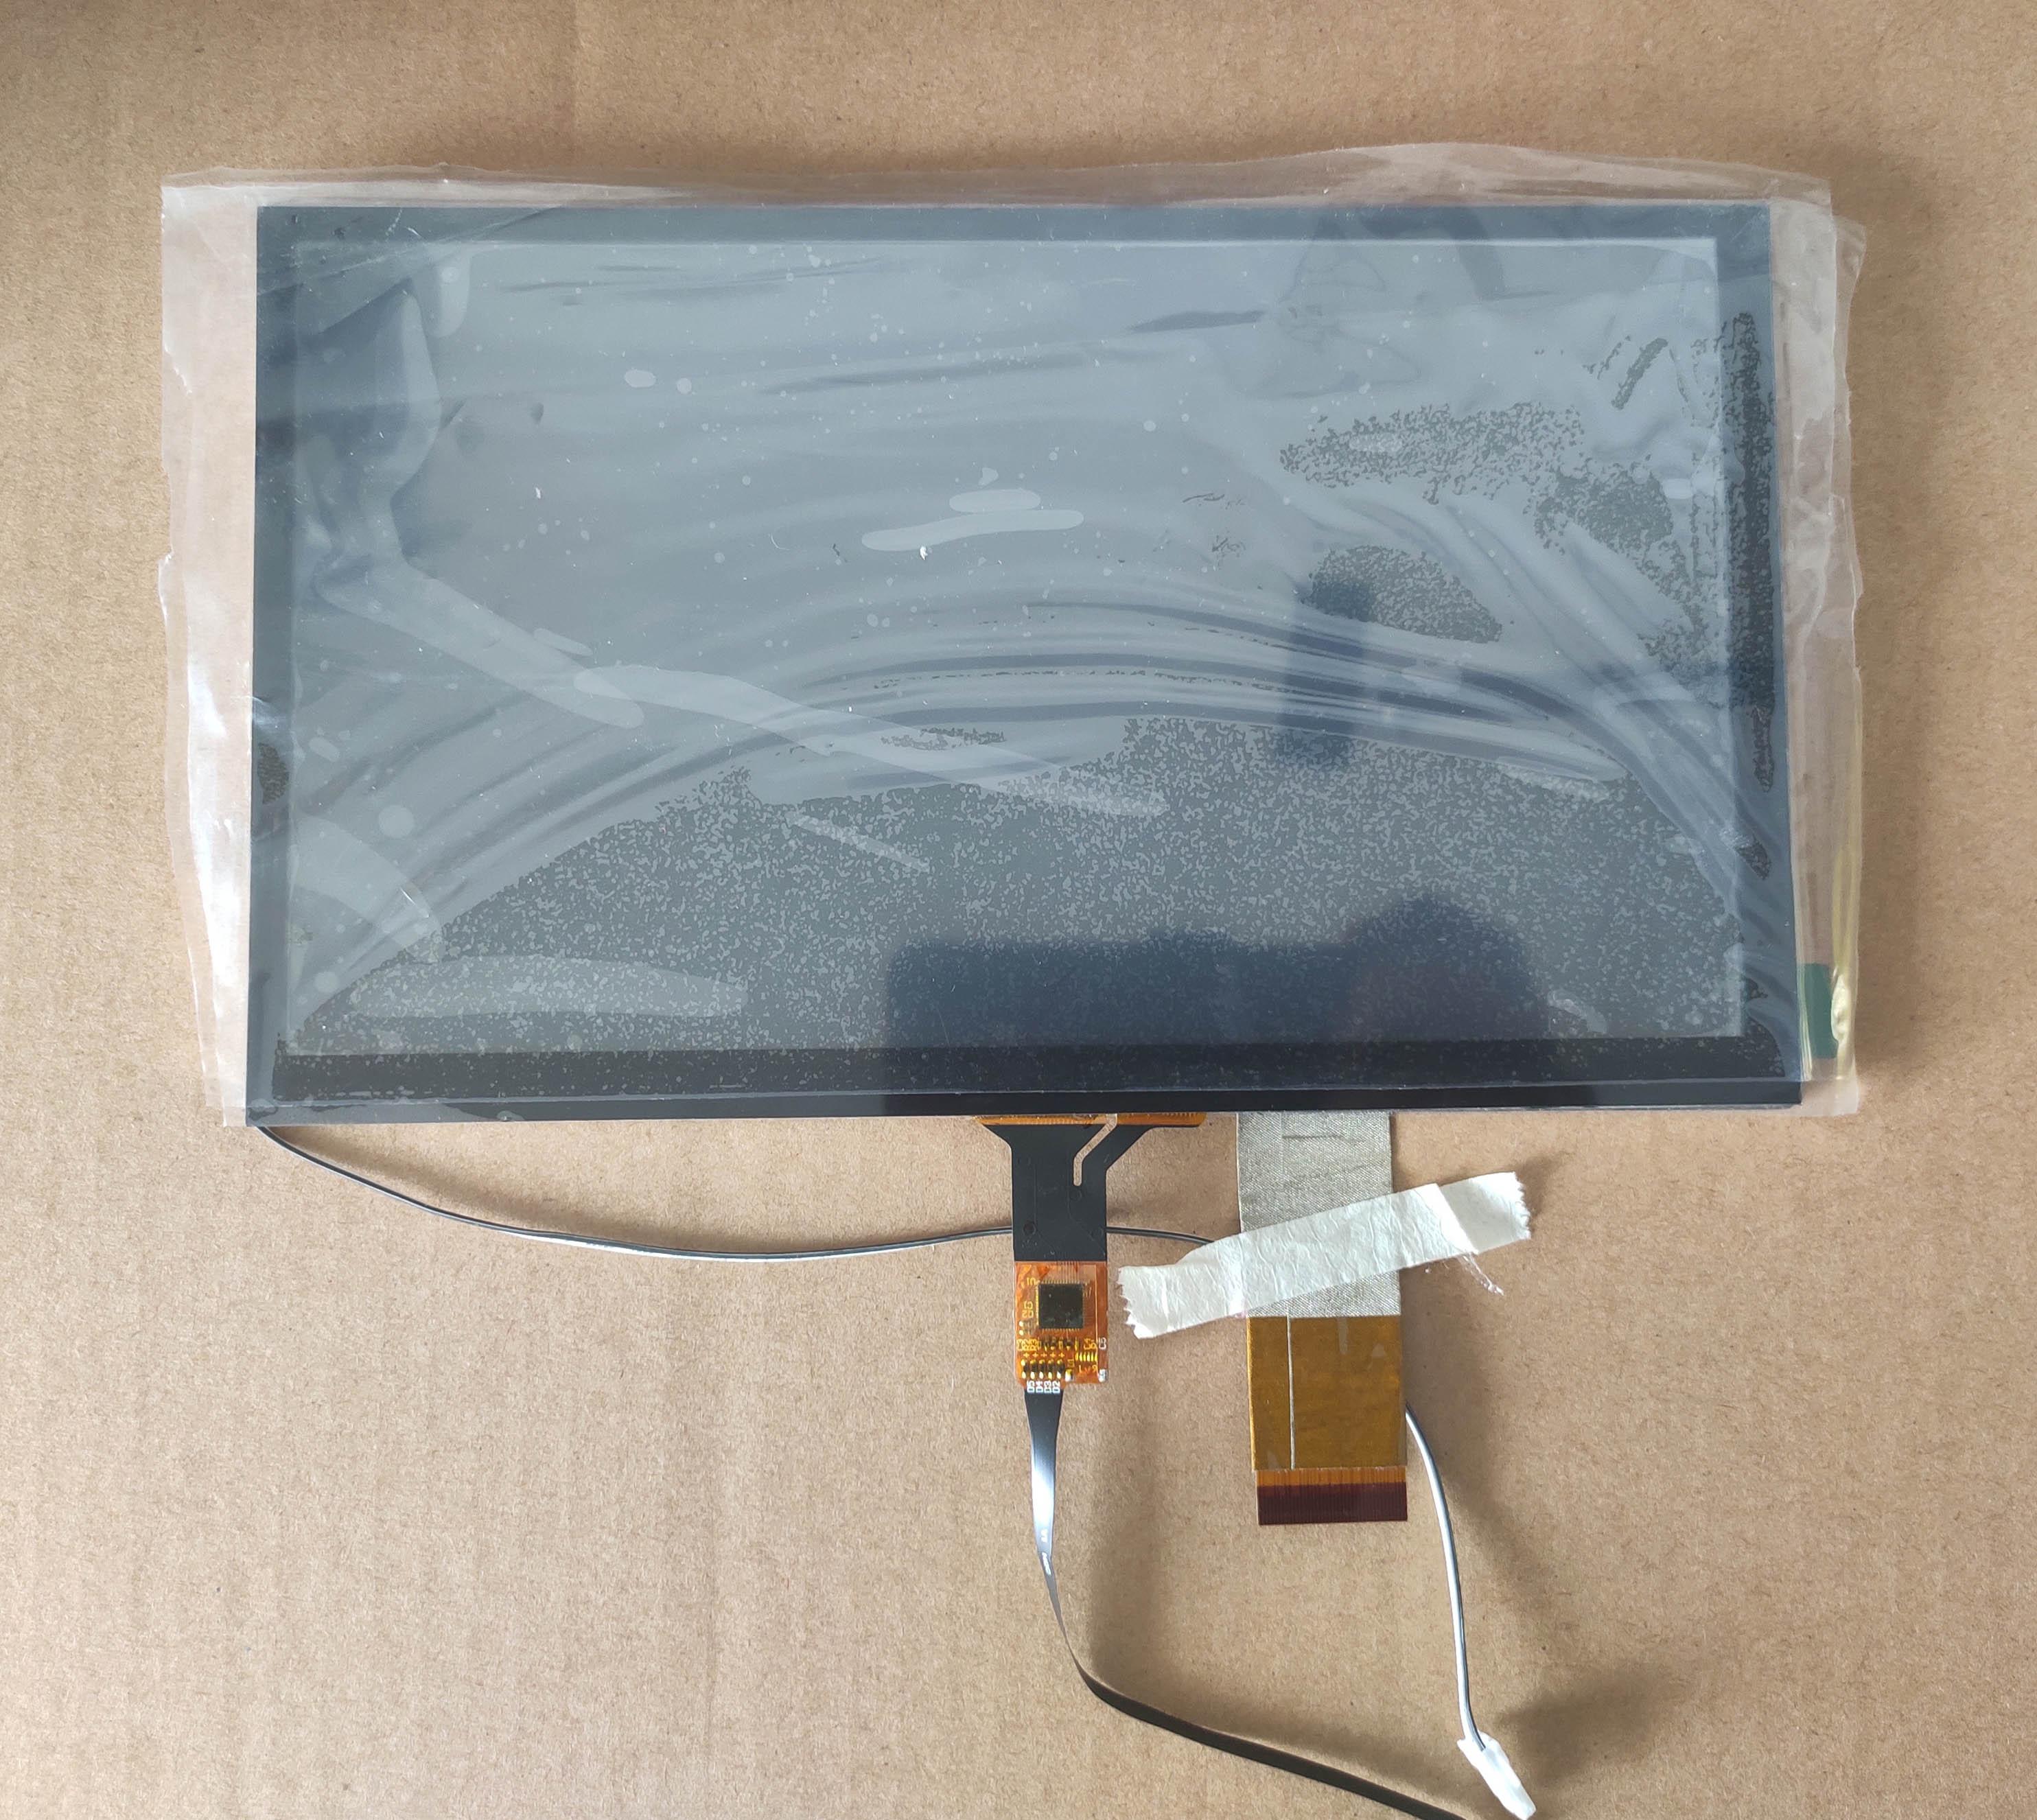 9inch Car Navigation Universal  LCD 40pin  1024*600 NEW  210*126mm  For  Car Radio 210*126mm GT911 6pin